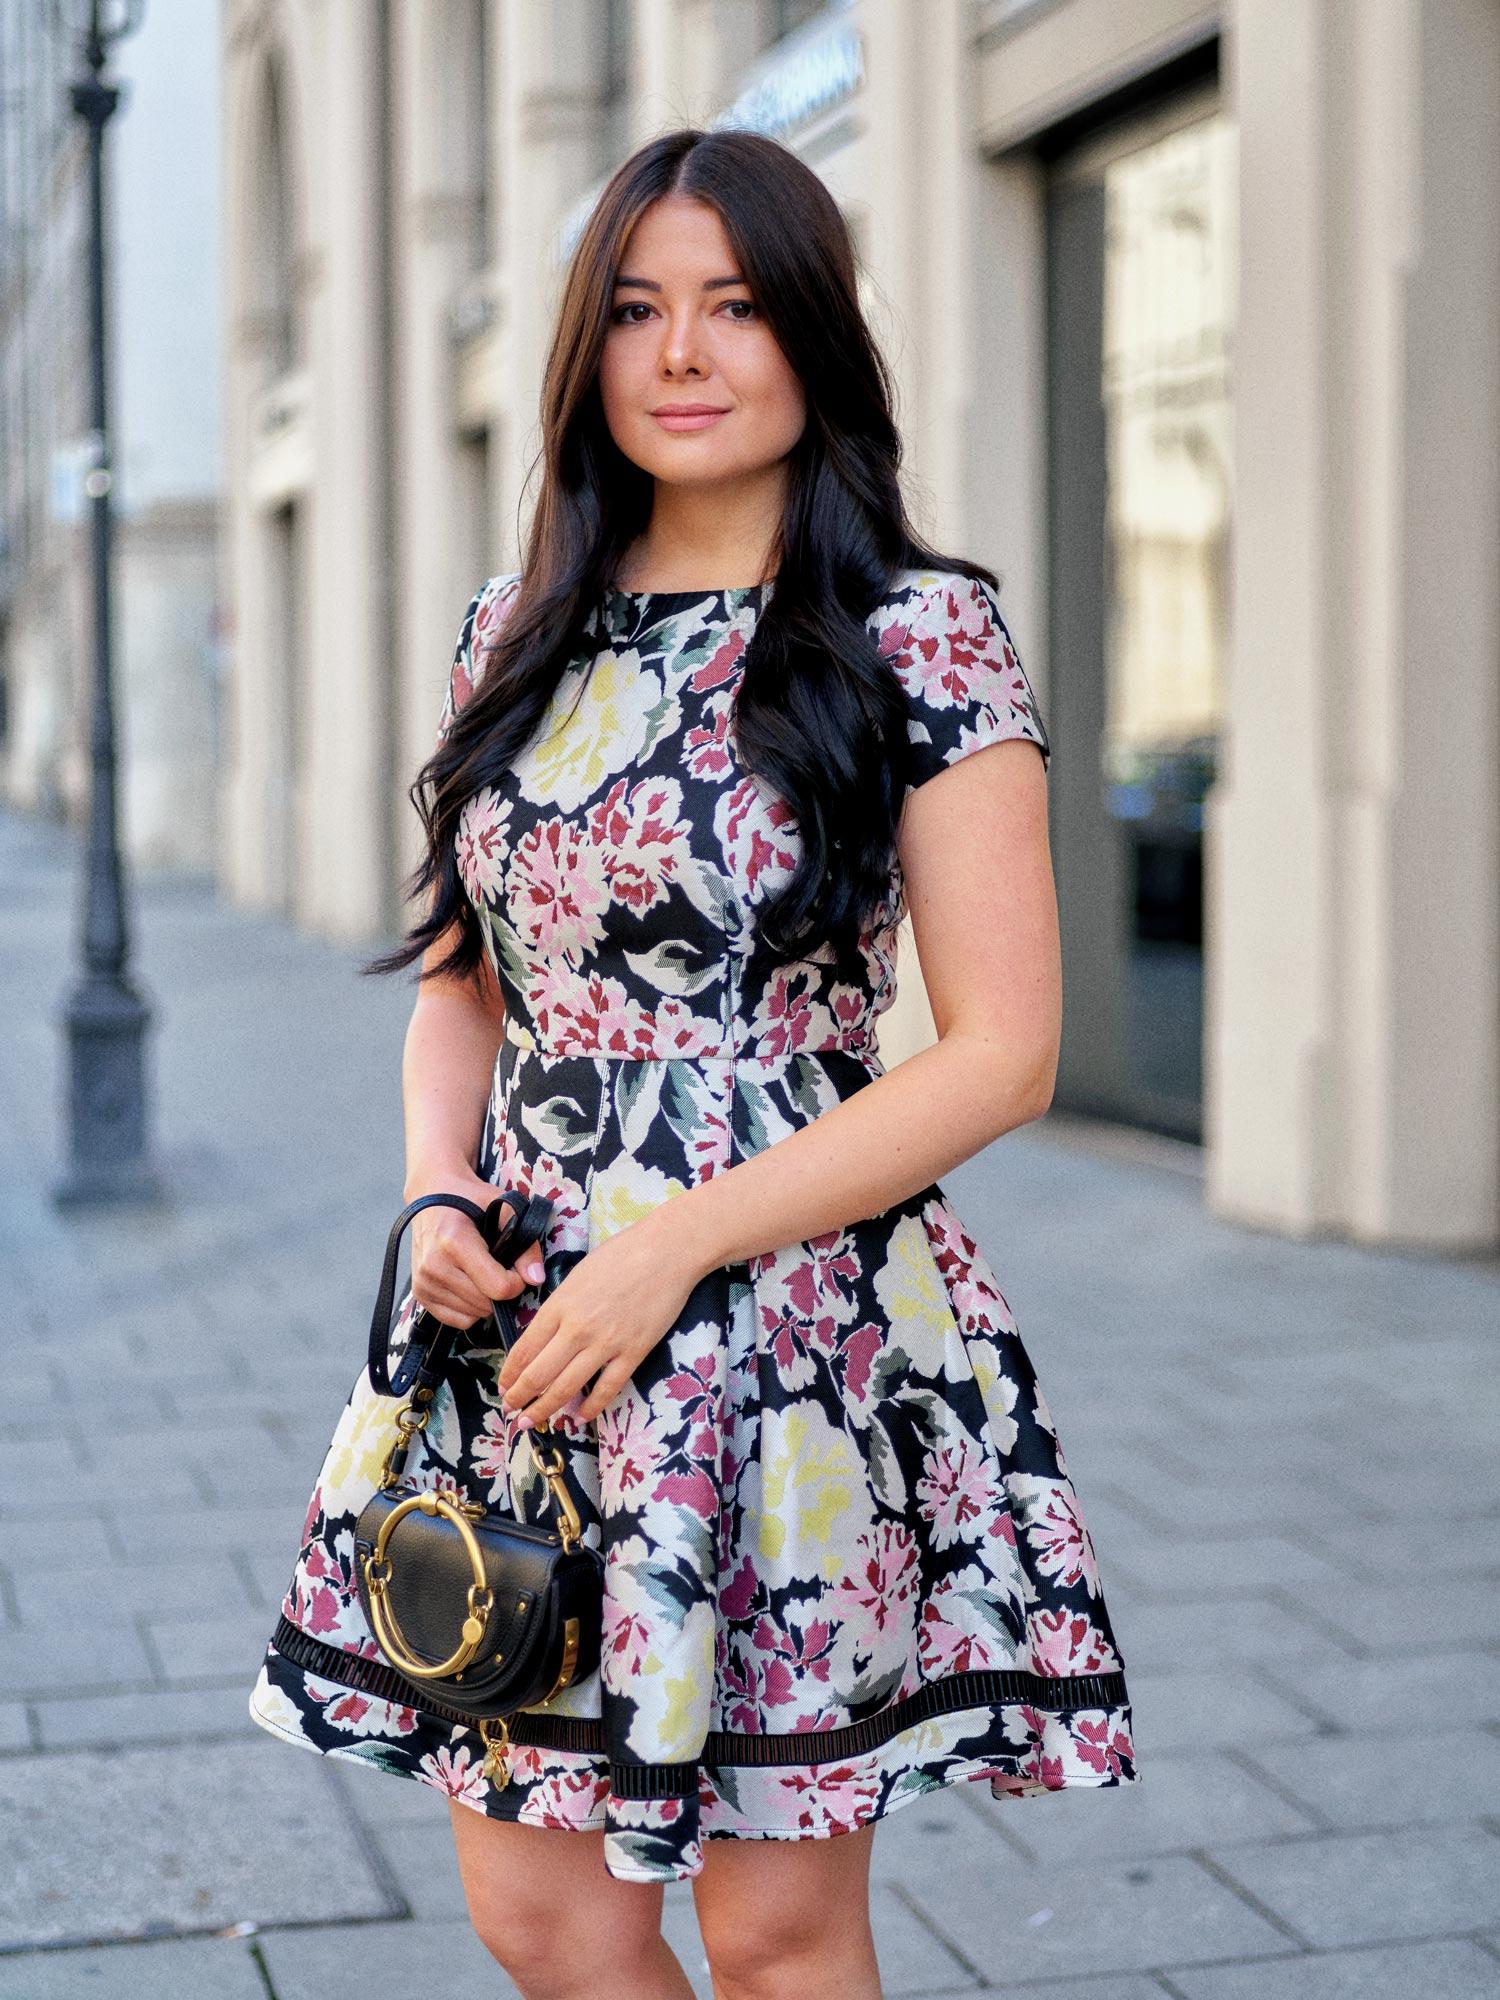 fashion-blogger-aus-muenchen-fashionblogger-lifestyleblogger-beautyblogger-fashion-blogger-modeblogger-modeblog-munich-blog-muenchen-feminine-kleider-blumenmuster